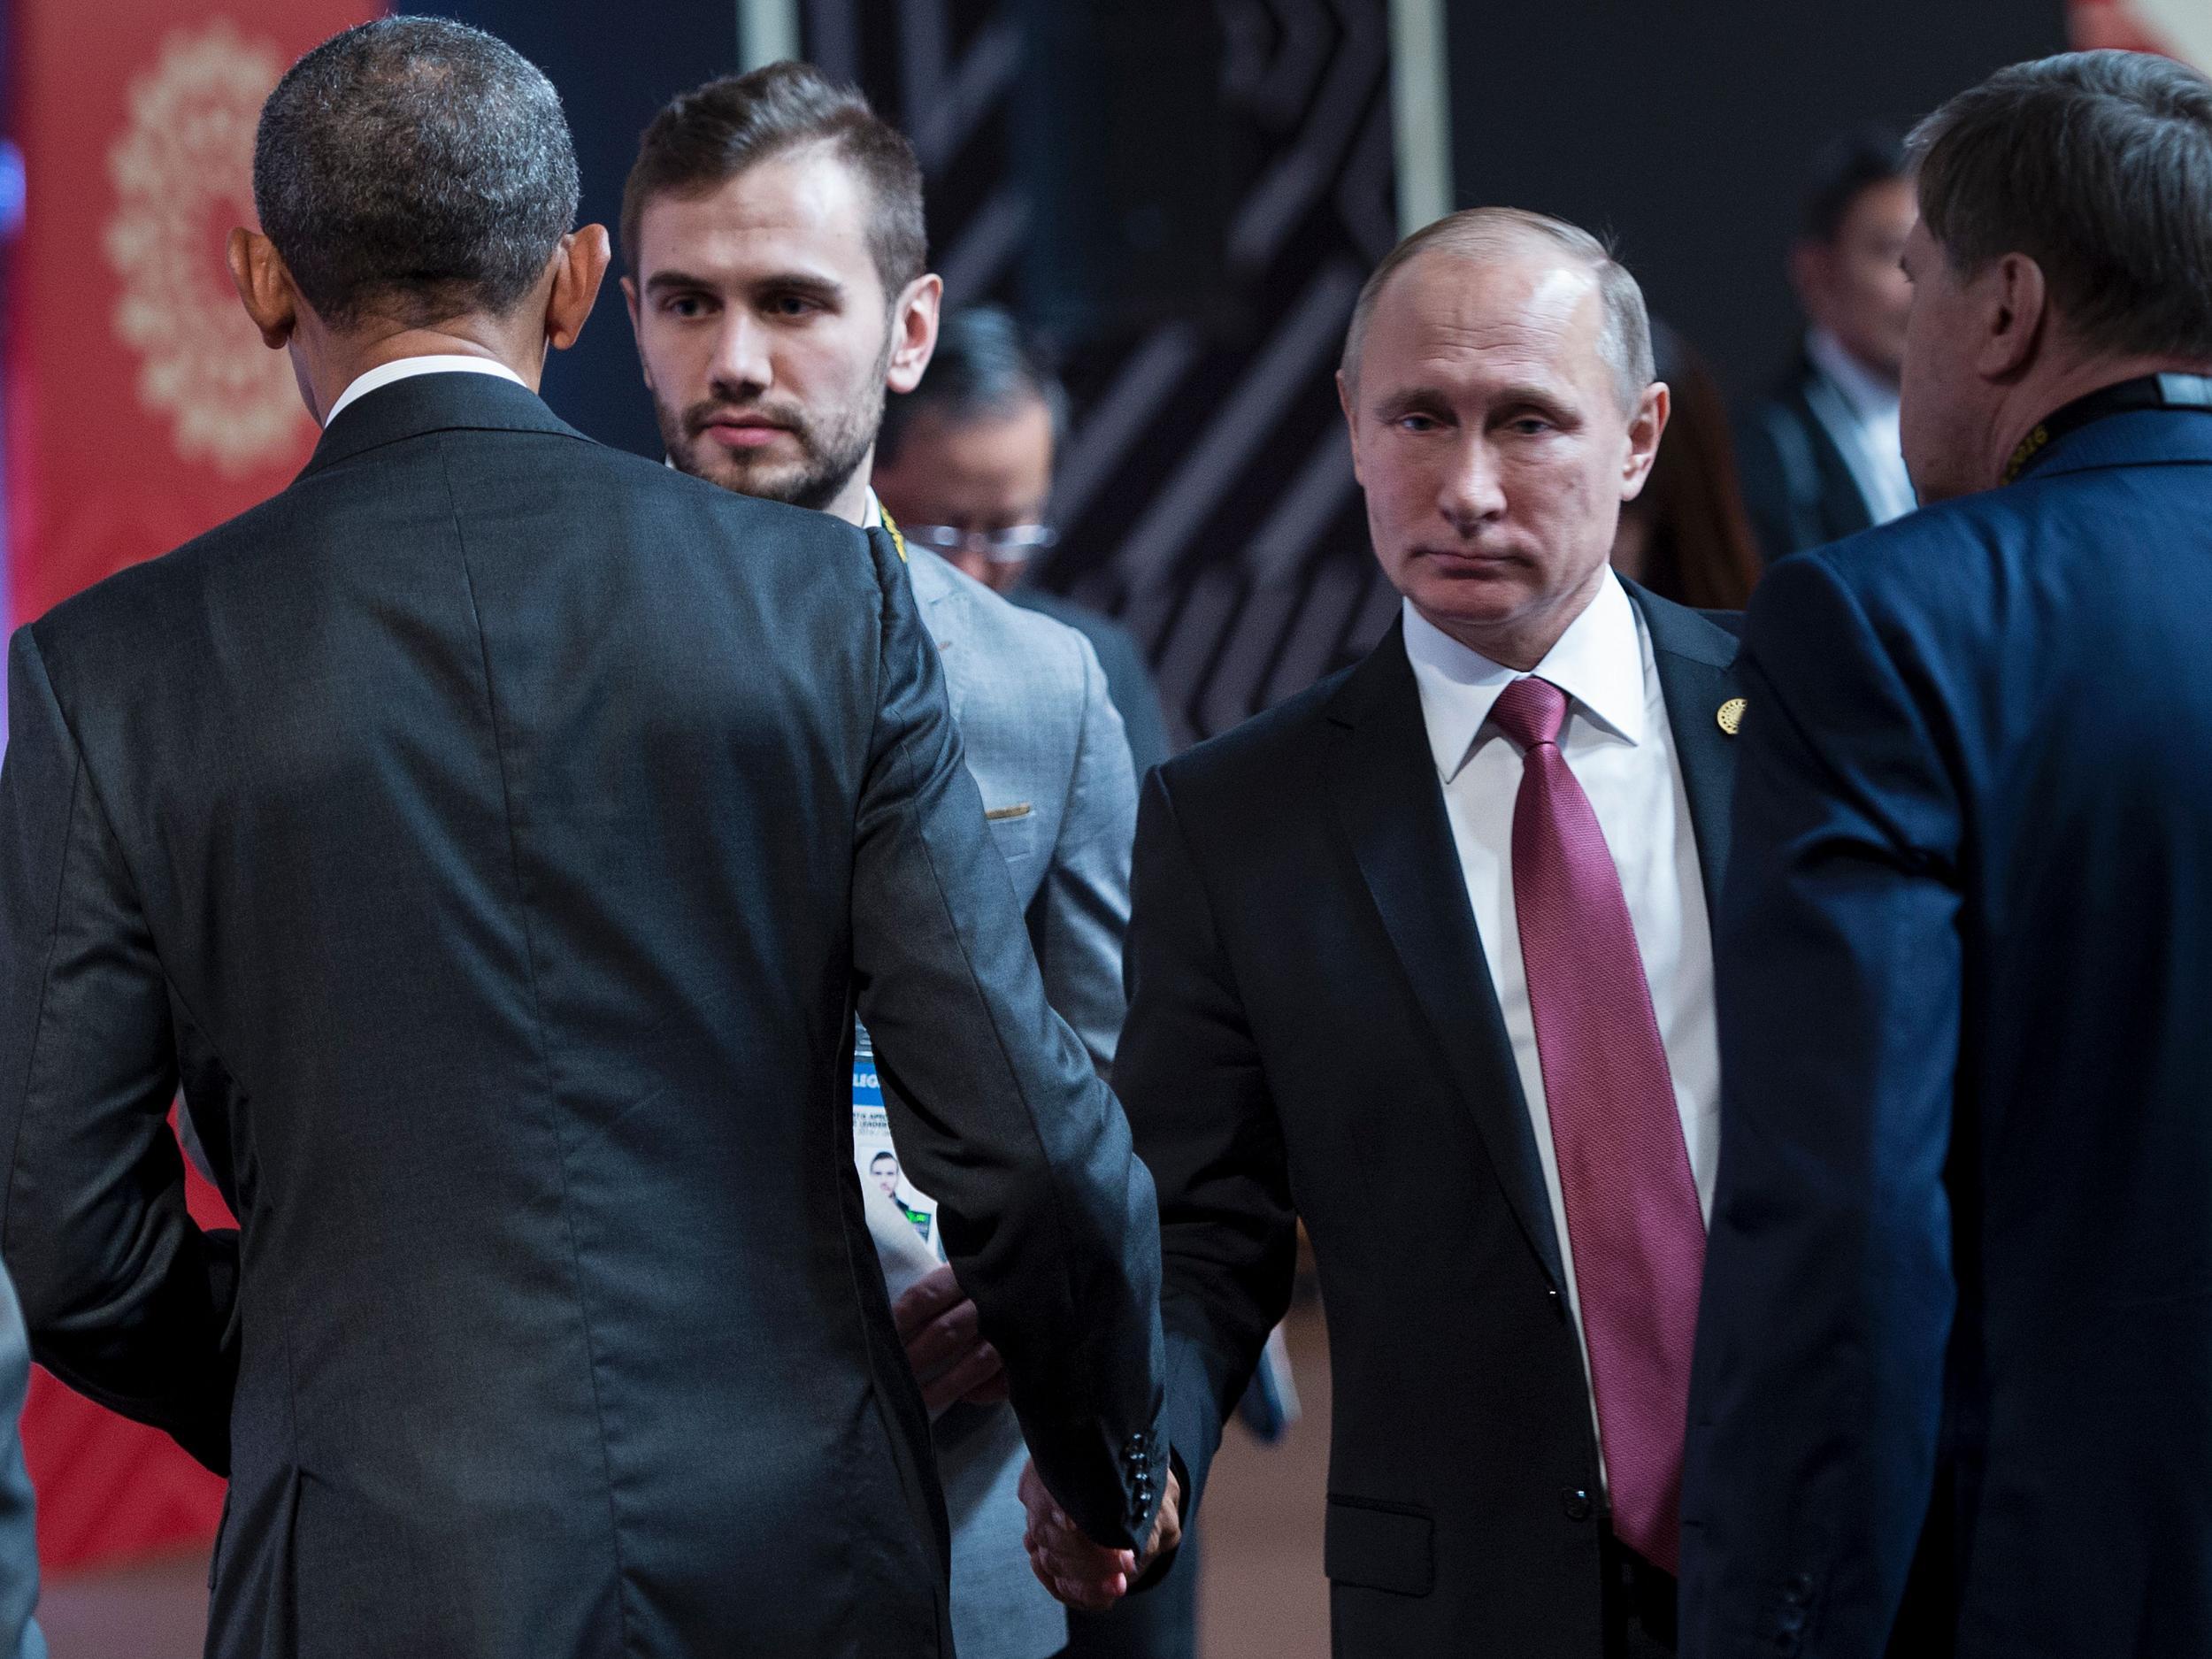 Barack Obama And Vladimir Putin Share Cold Awkward Handshake At